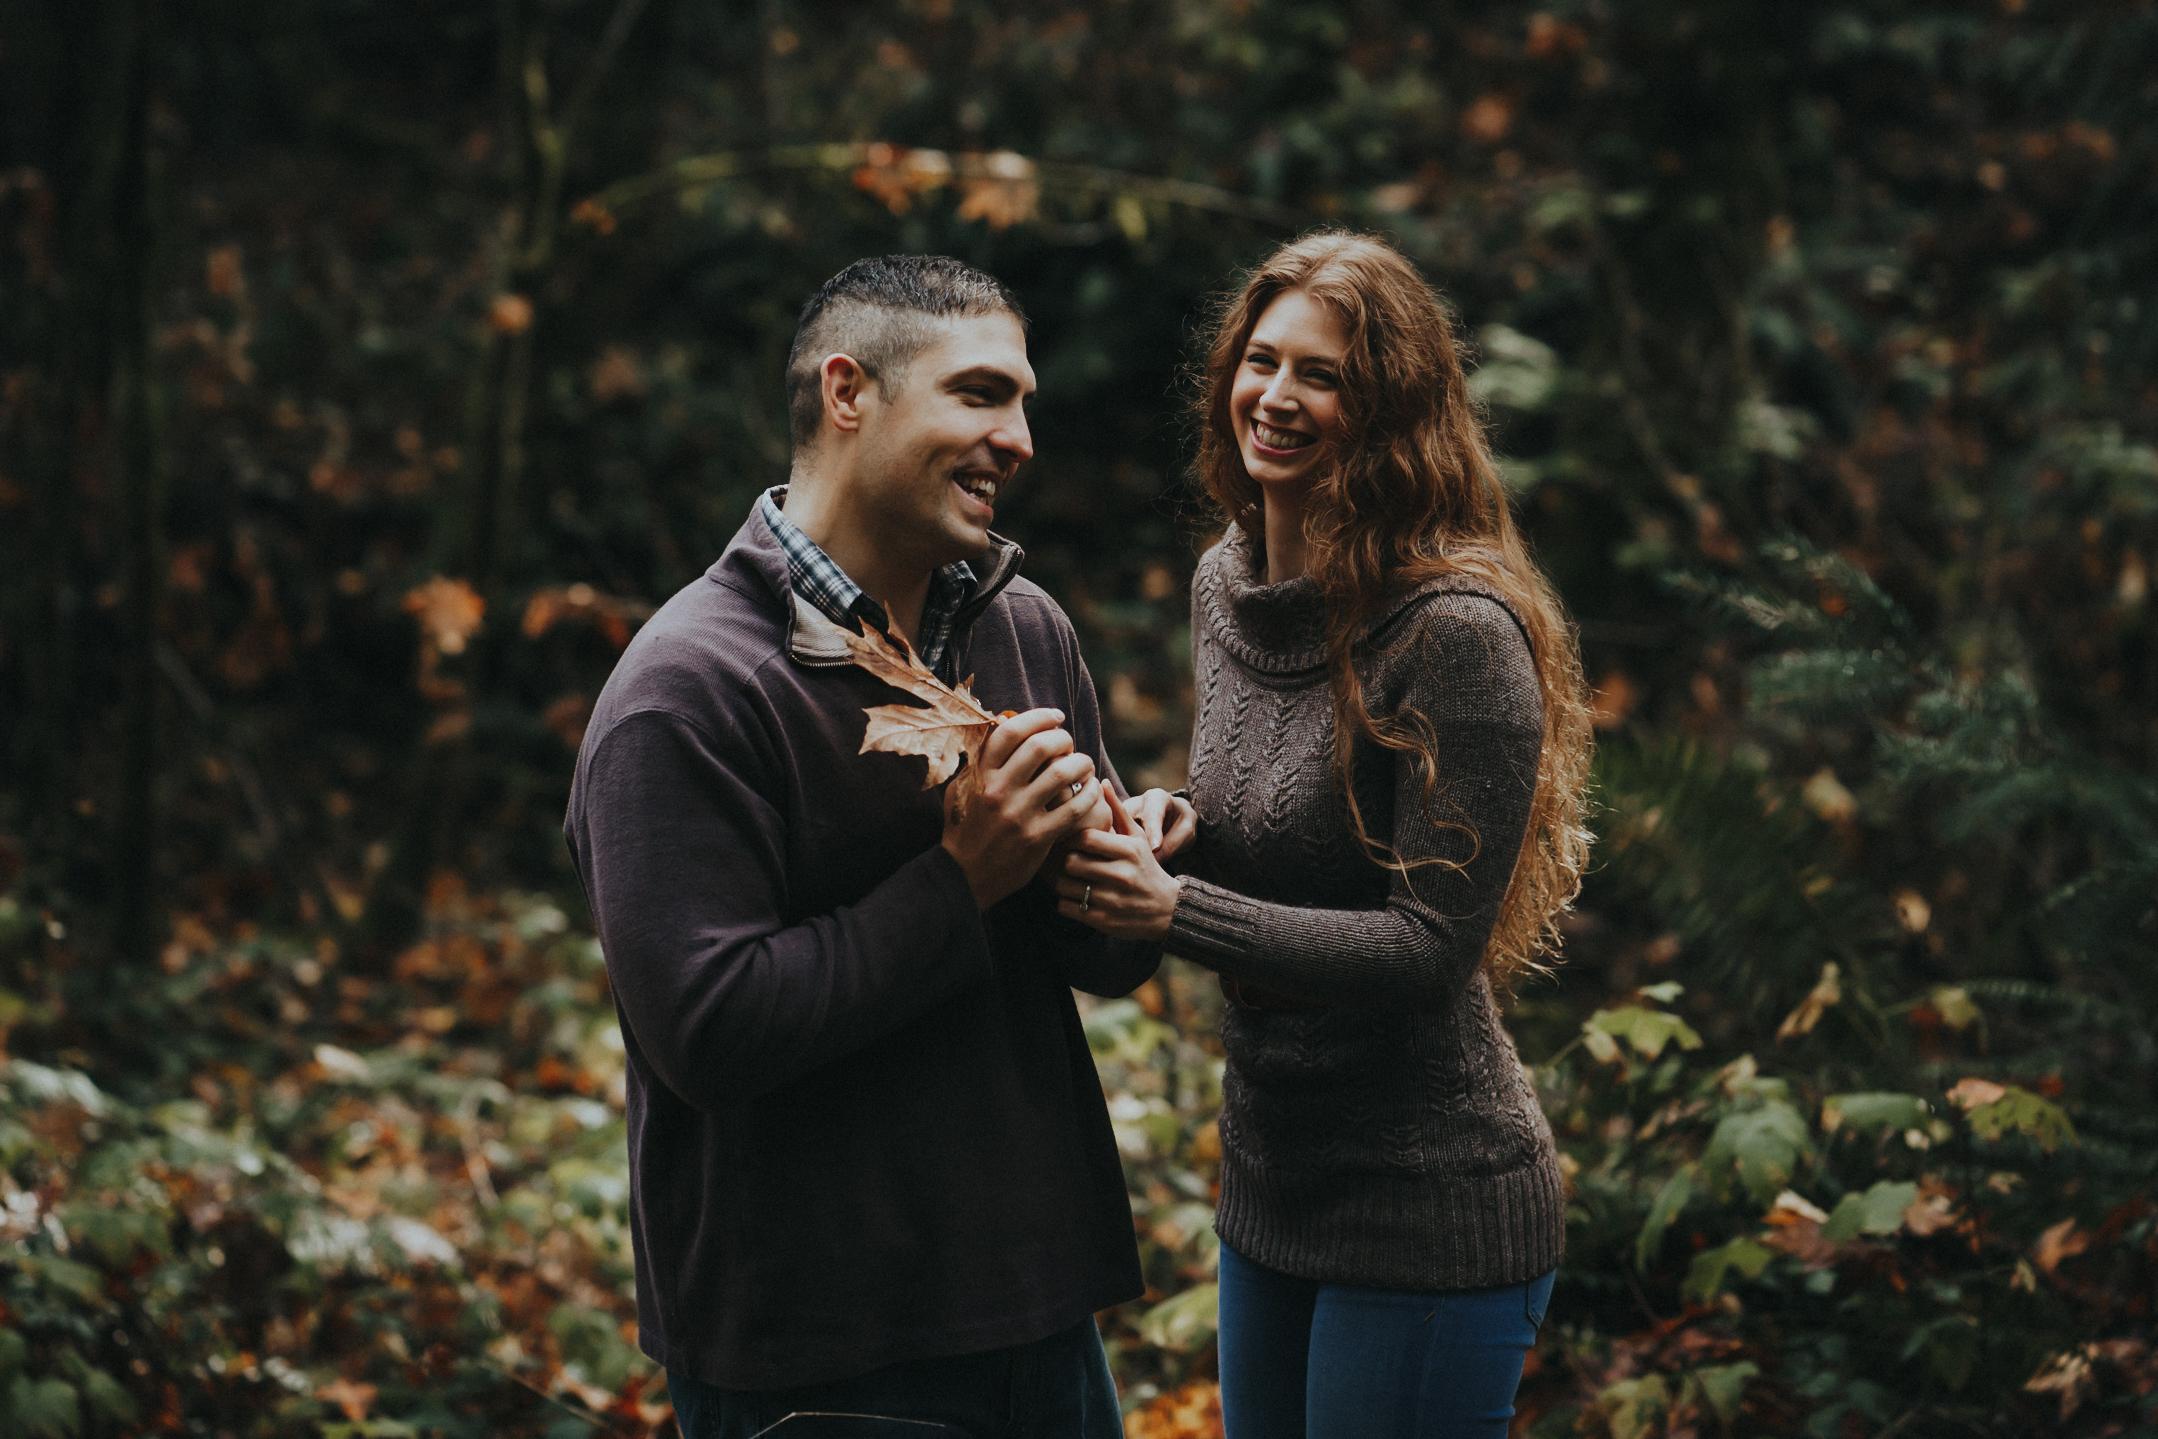 Portland_Wilsonville_Wedding_Engagement_Photographer-0395.jpg